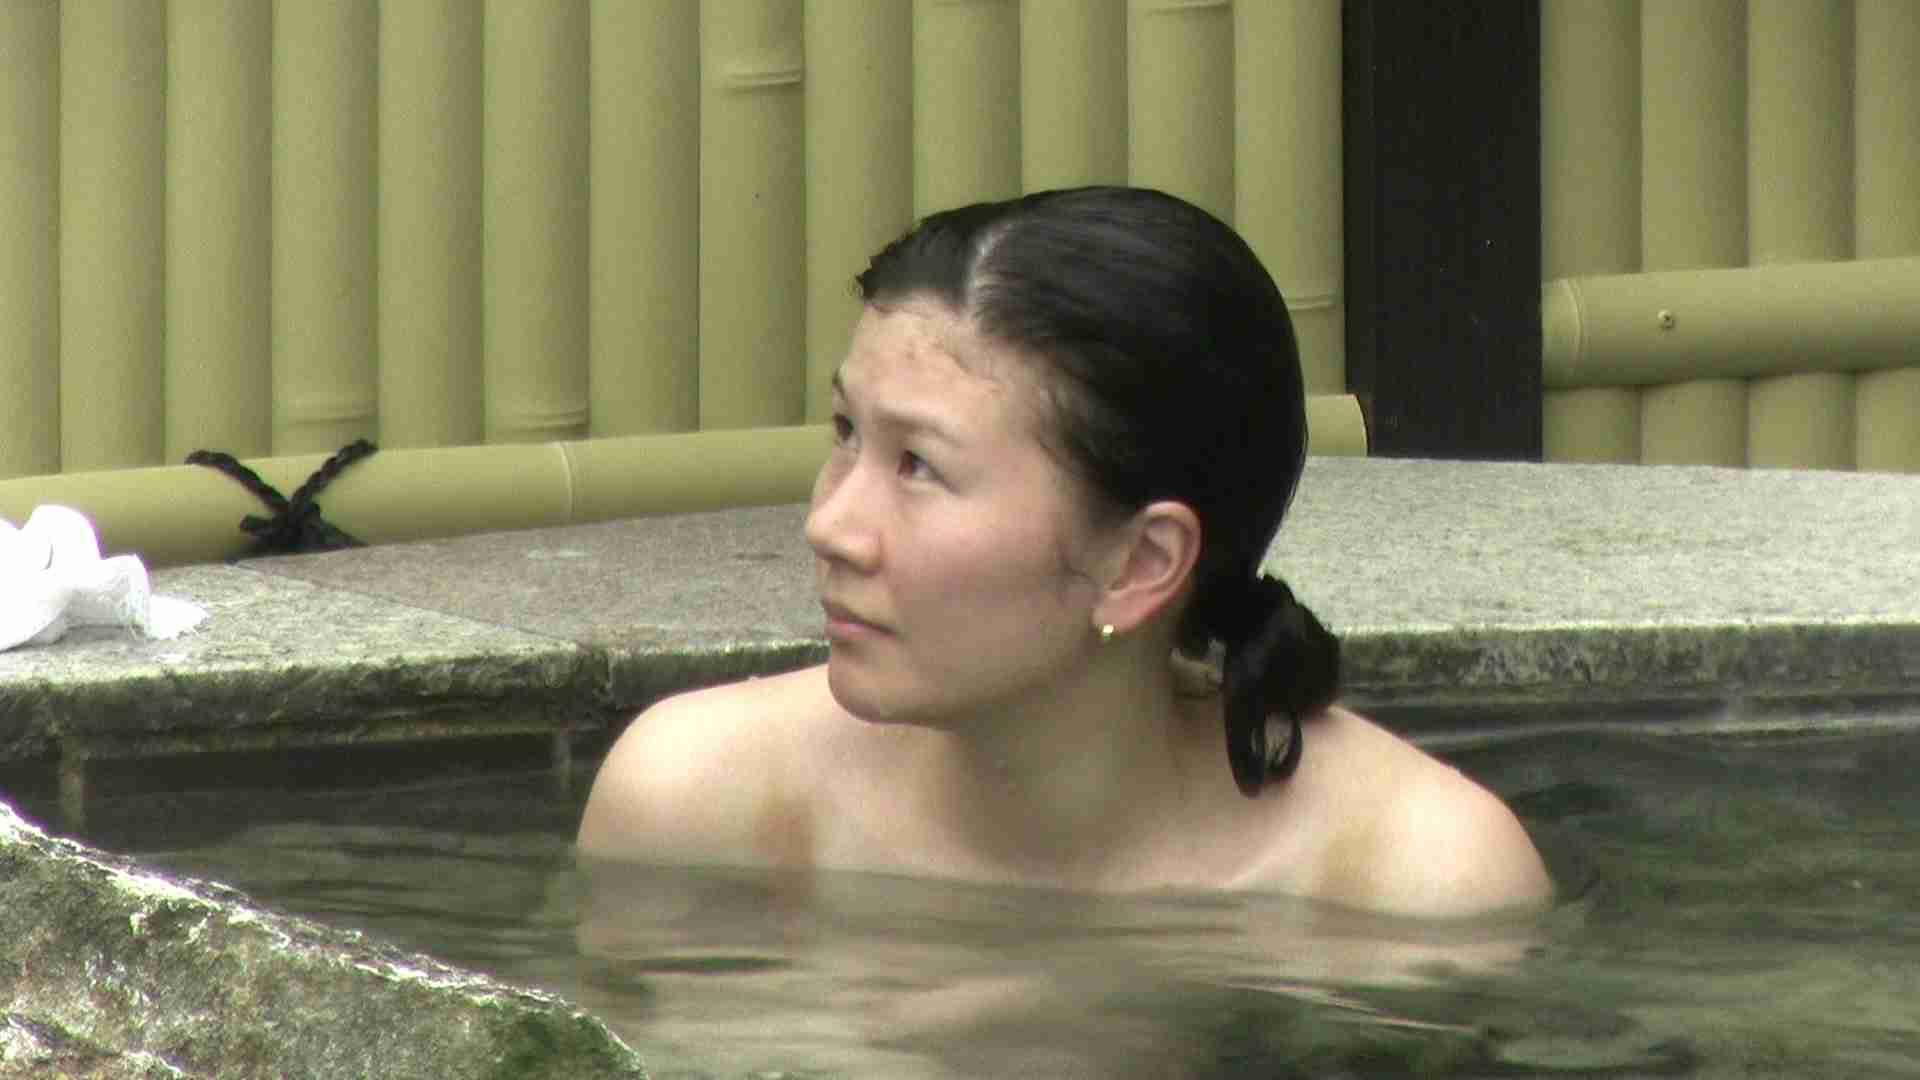 Aquaな露天風呂Vol.187 盗撮   HなOL  96pic 25